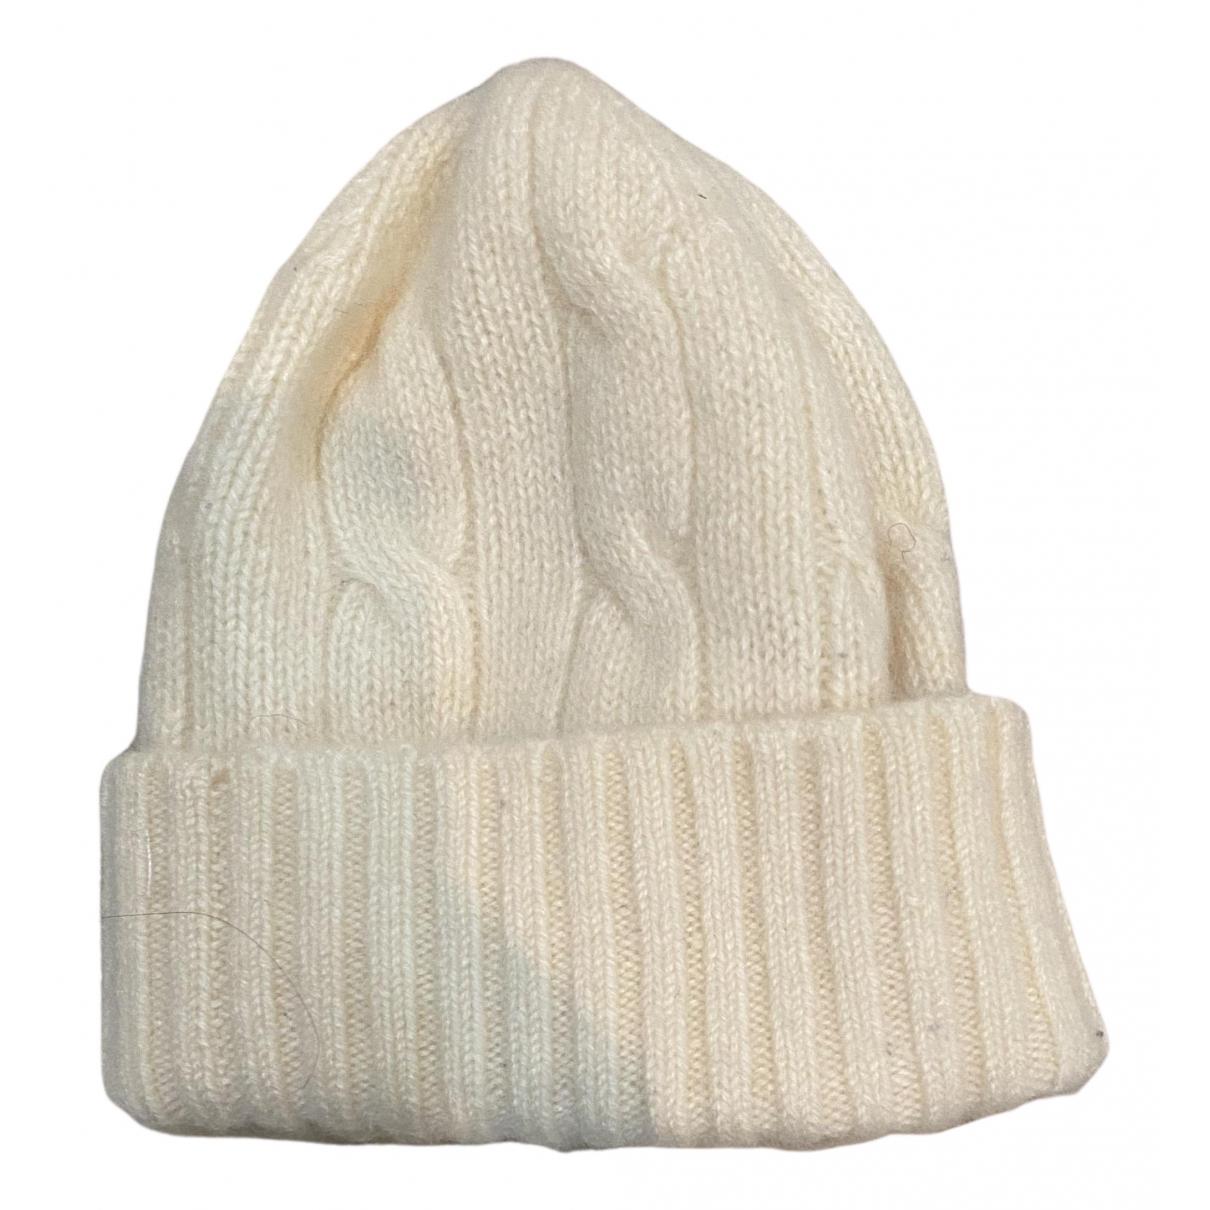 Polo Ralph Lauren \N Hut, Muetzen, Handschuhe in  Ecru Kaschmir